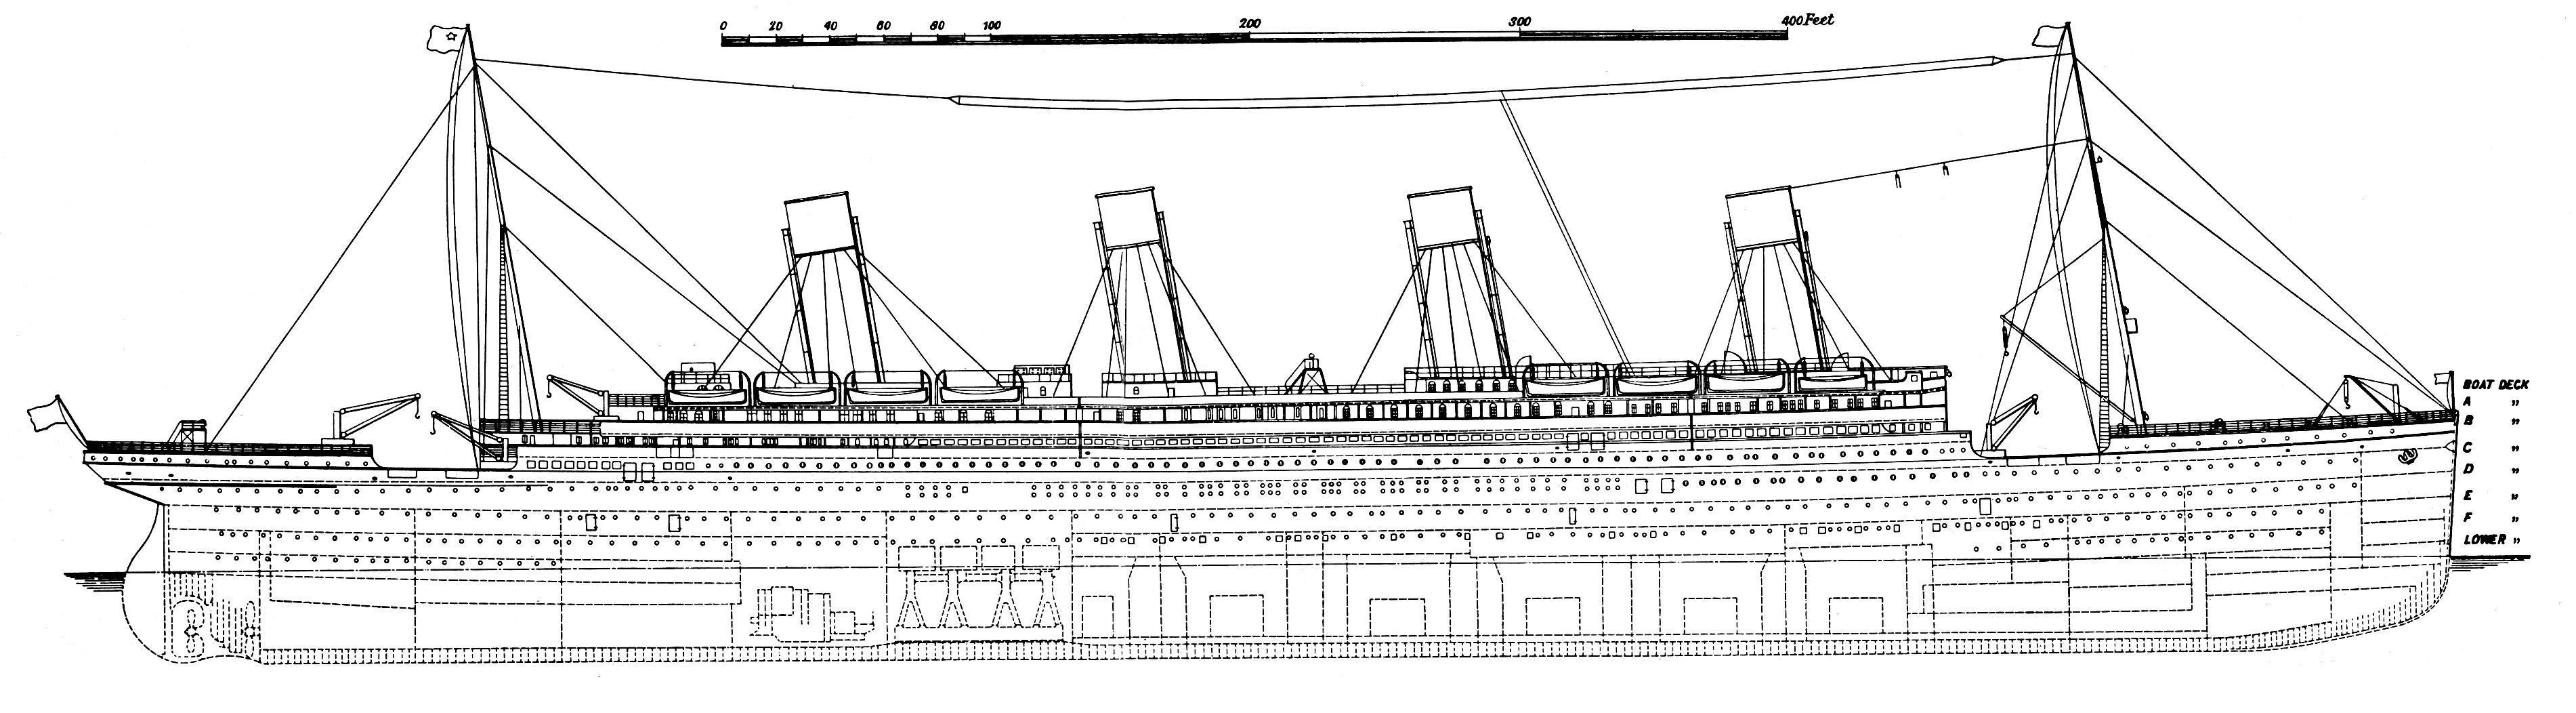 titanic cross section [ 3803 x 1052 Pixel ]